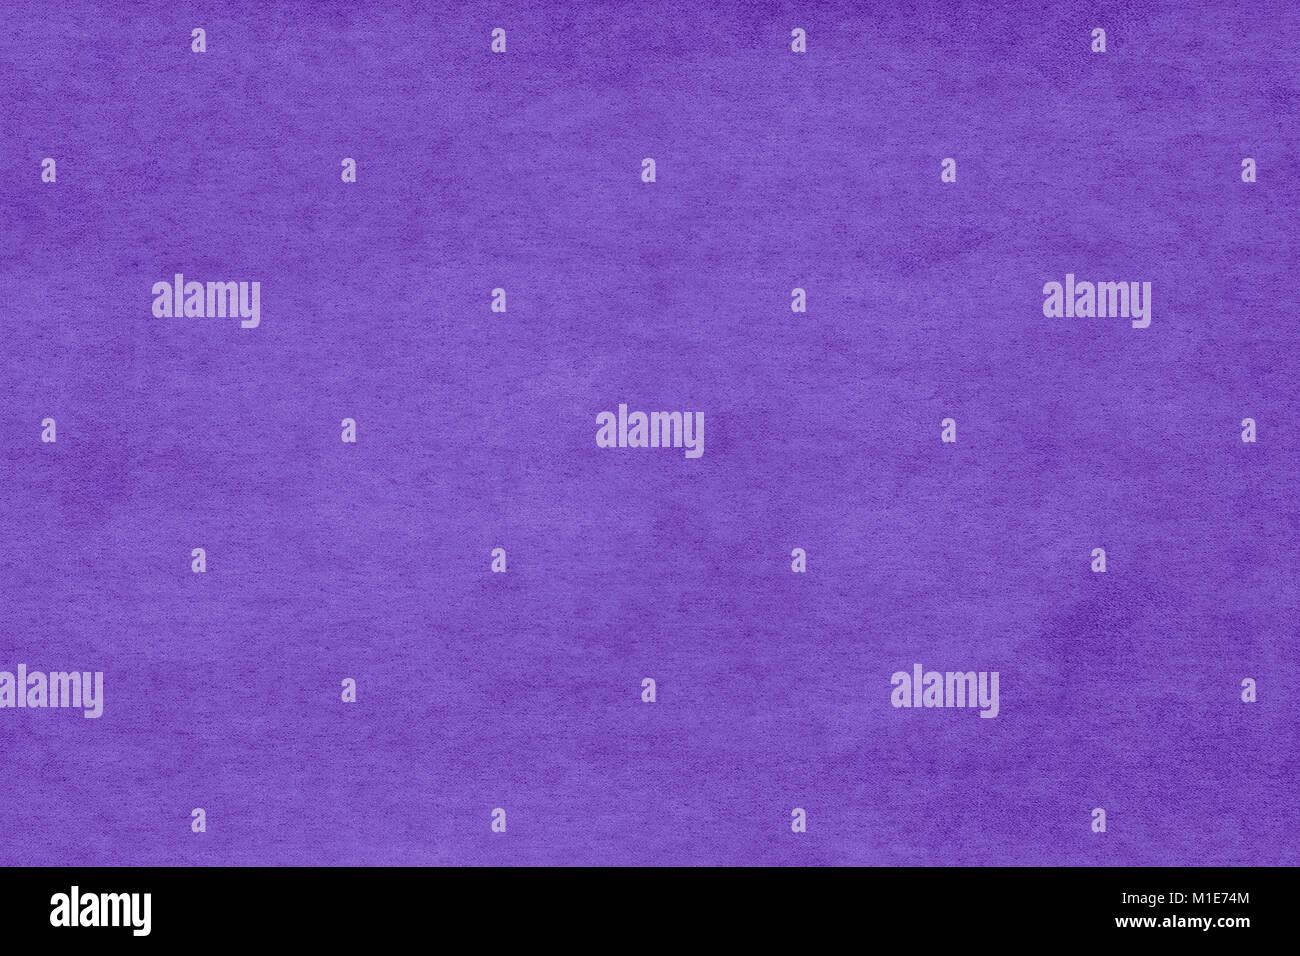 purple carpet texture. Abstract Purple Felt Background. Velvet - Stock Image Carpet Texture